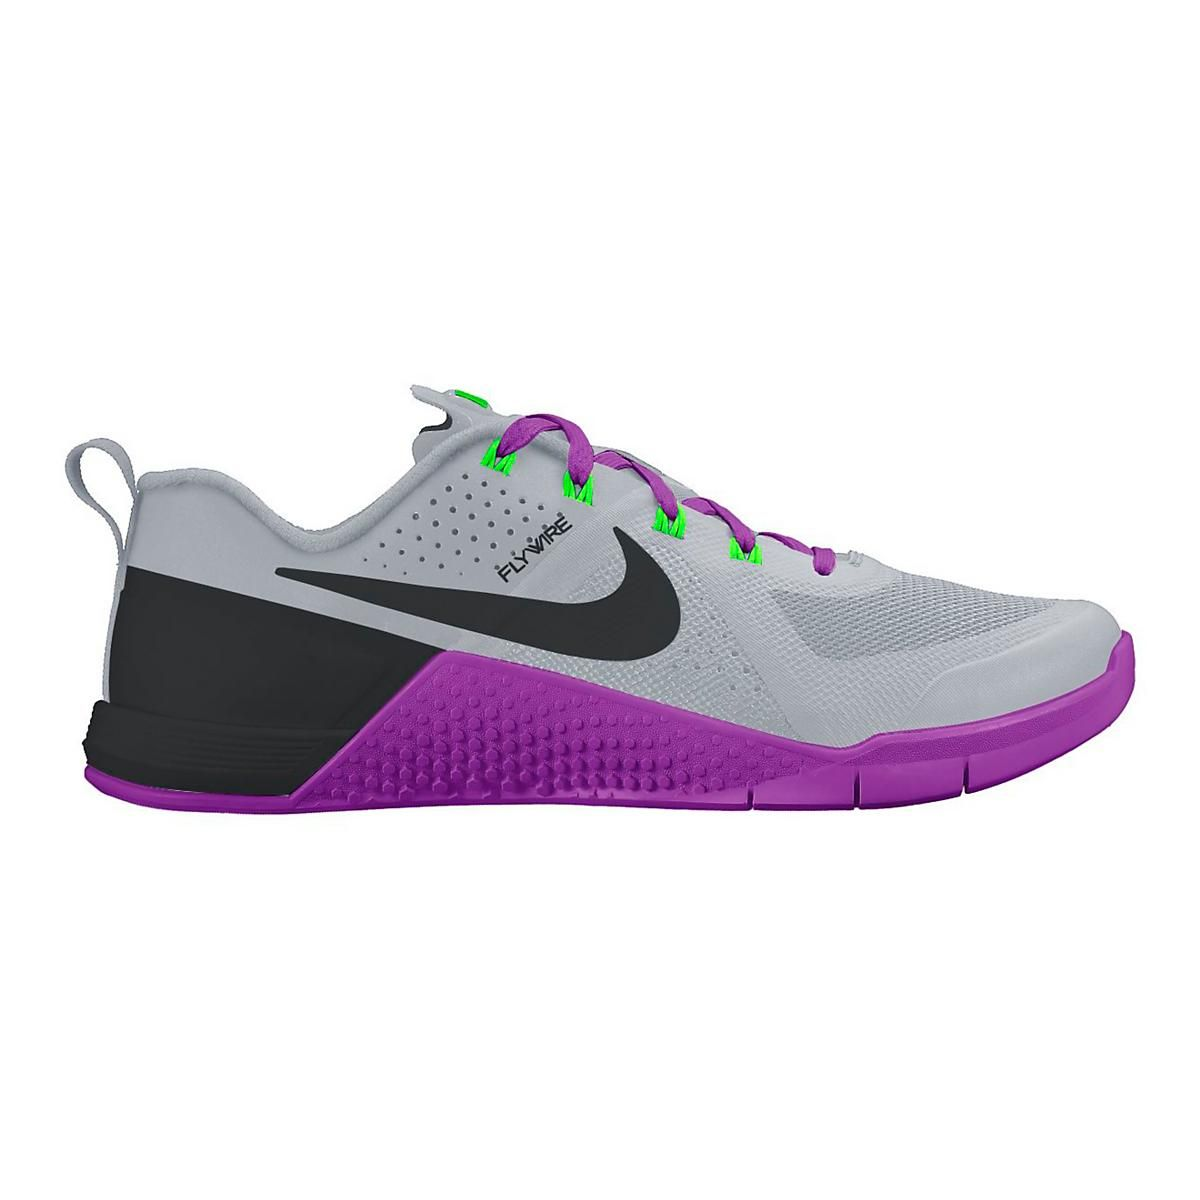 buy online e7157 8463d Nike Retcons BlackWhite - Size 9. From RoadRunner. Mis nuevos tenis para  entrenar 2016